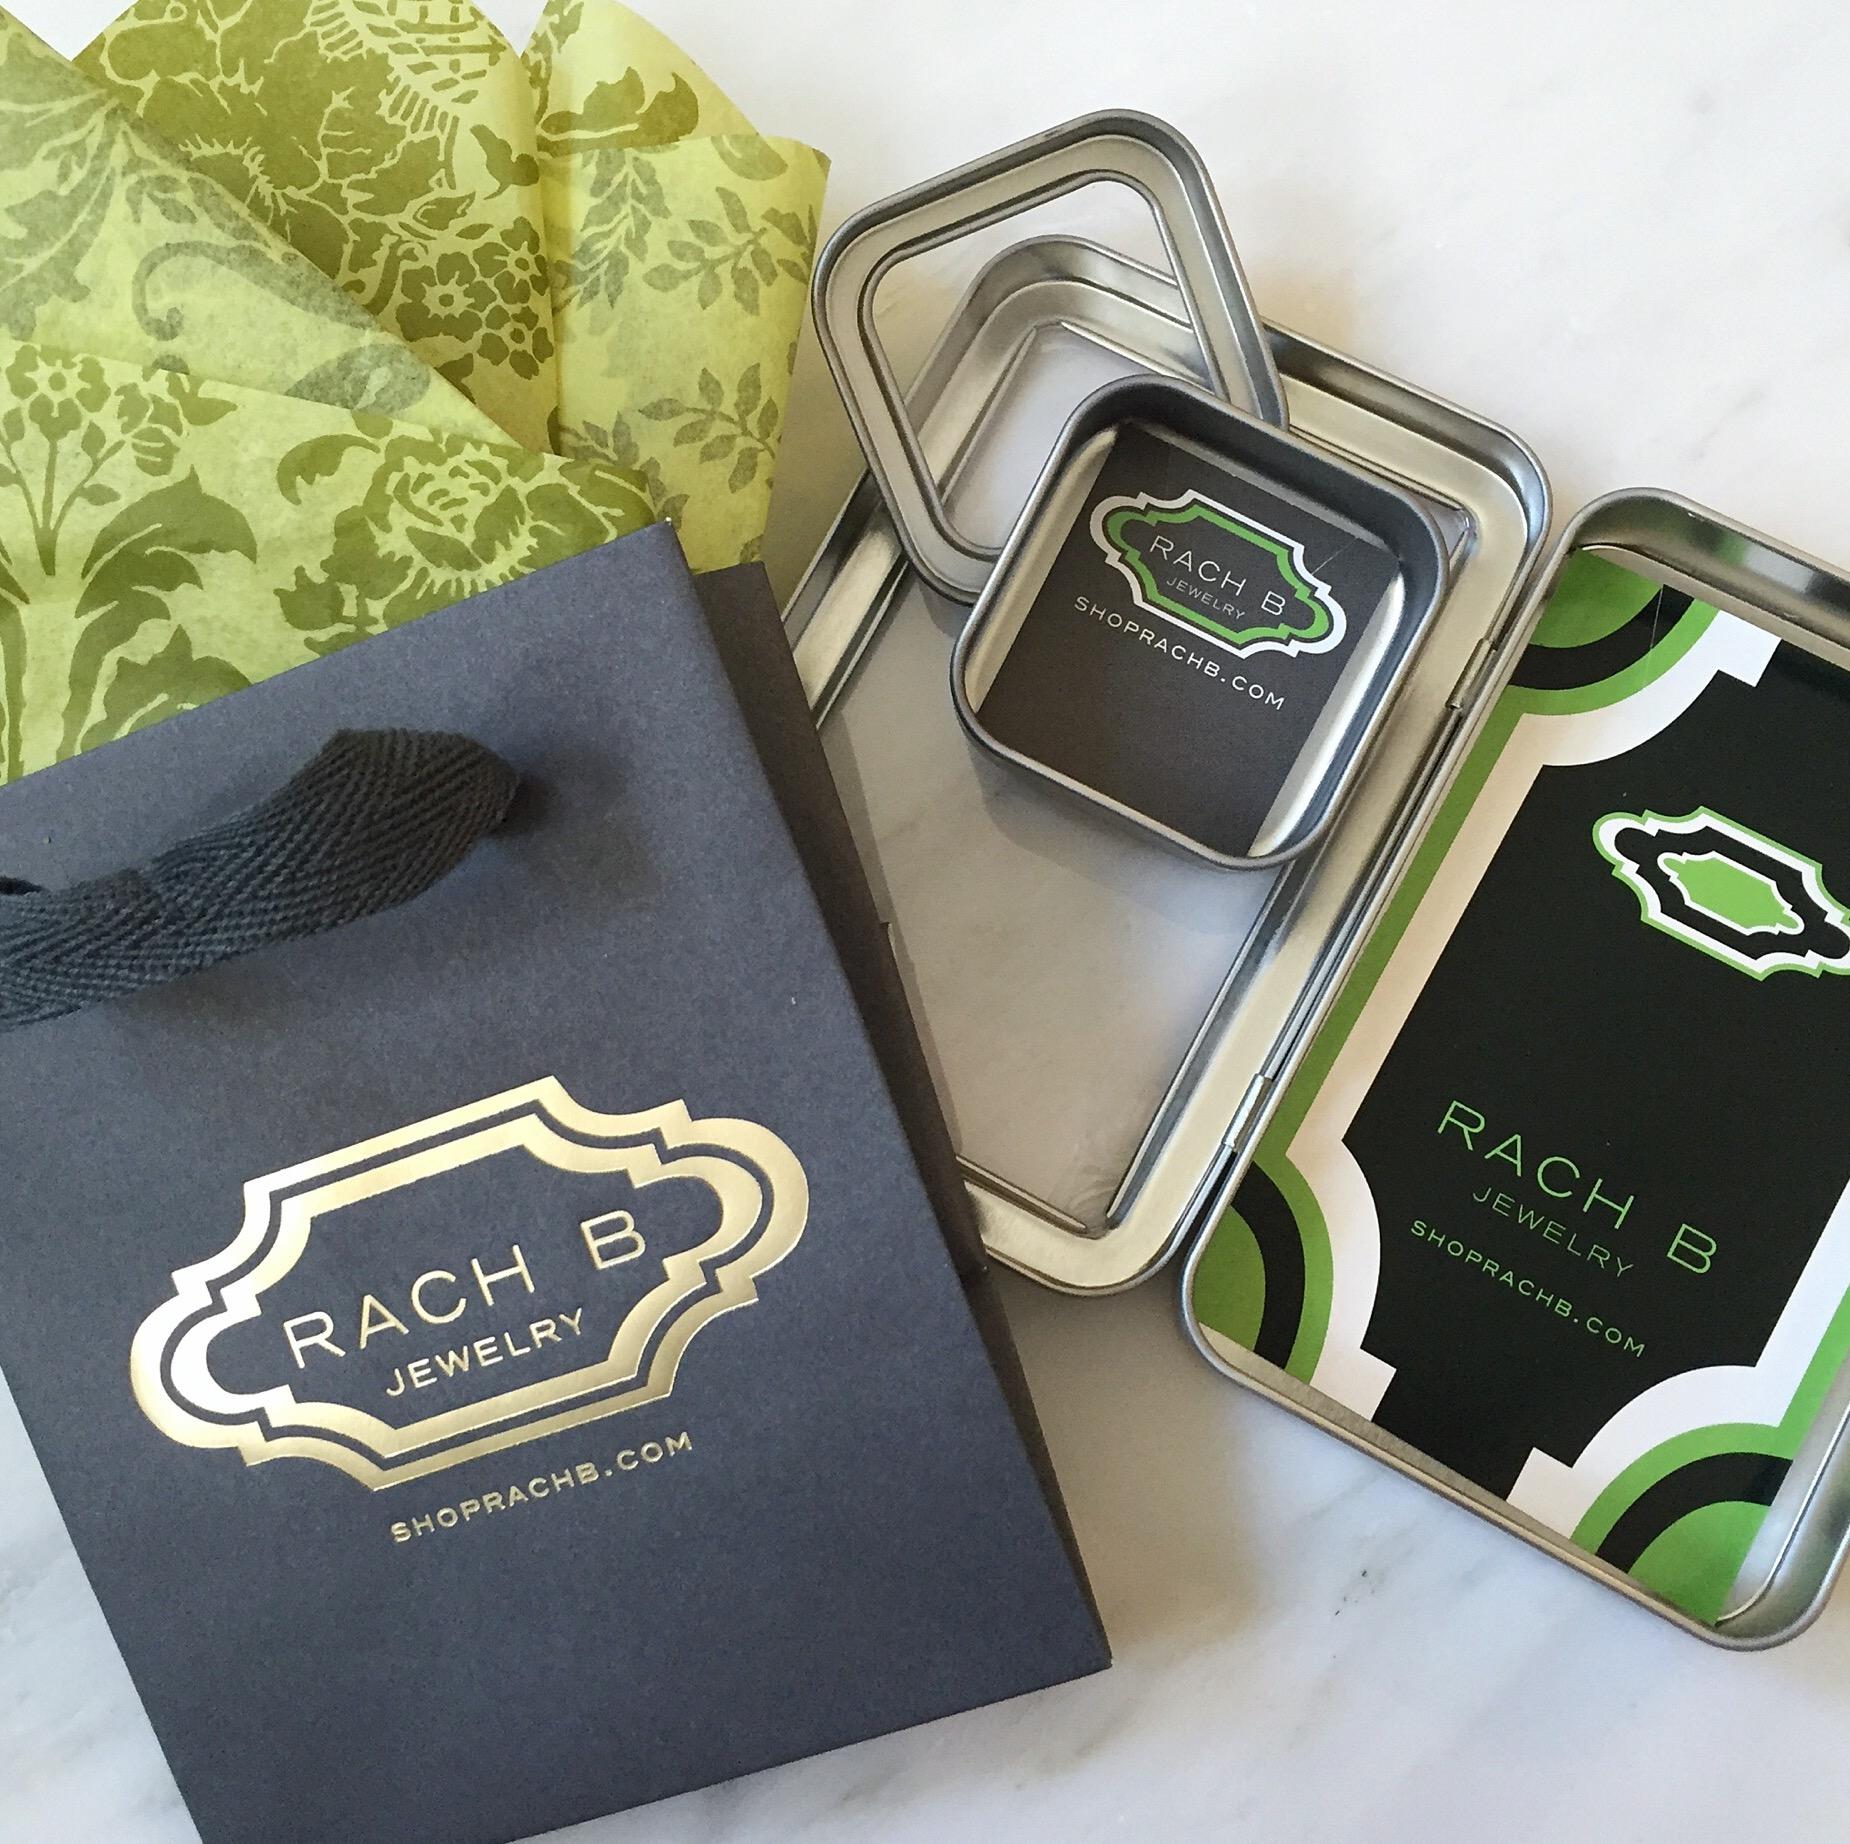 Rach B Jewelry Packaging.jpg